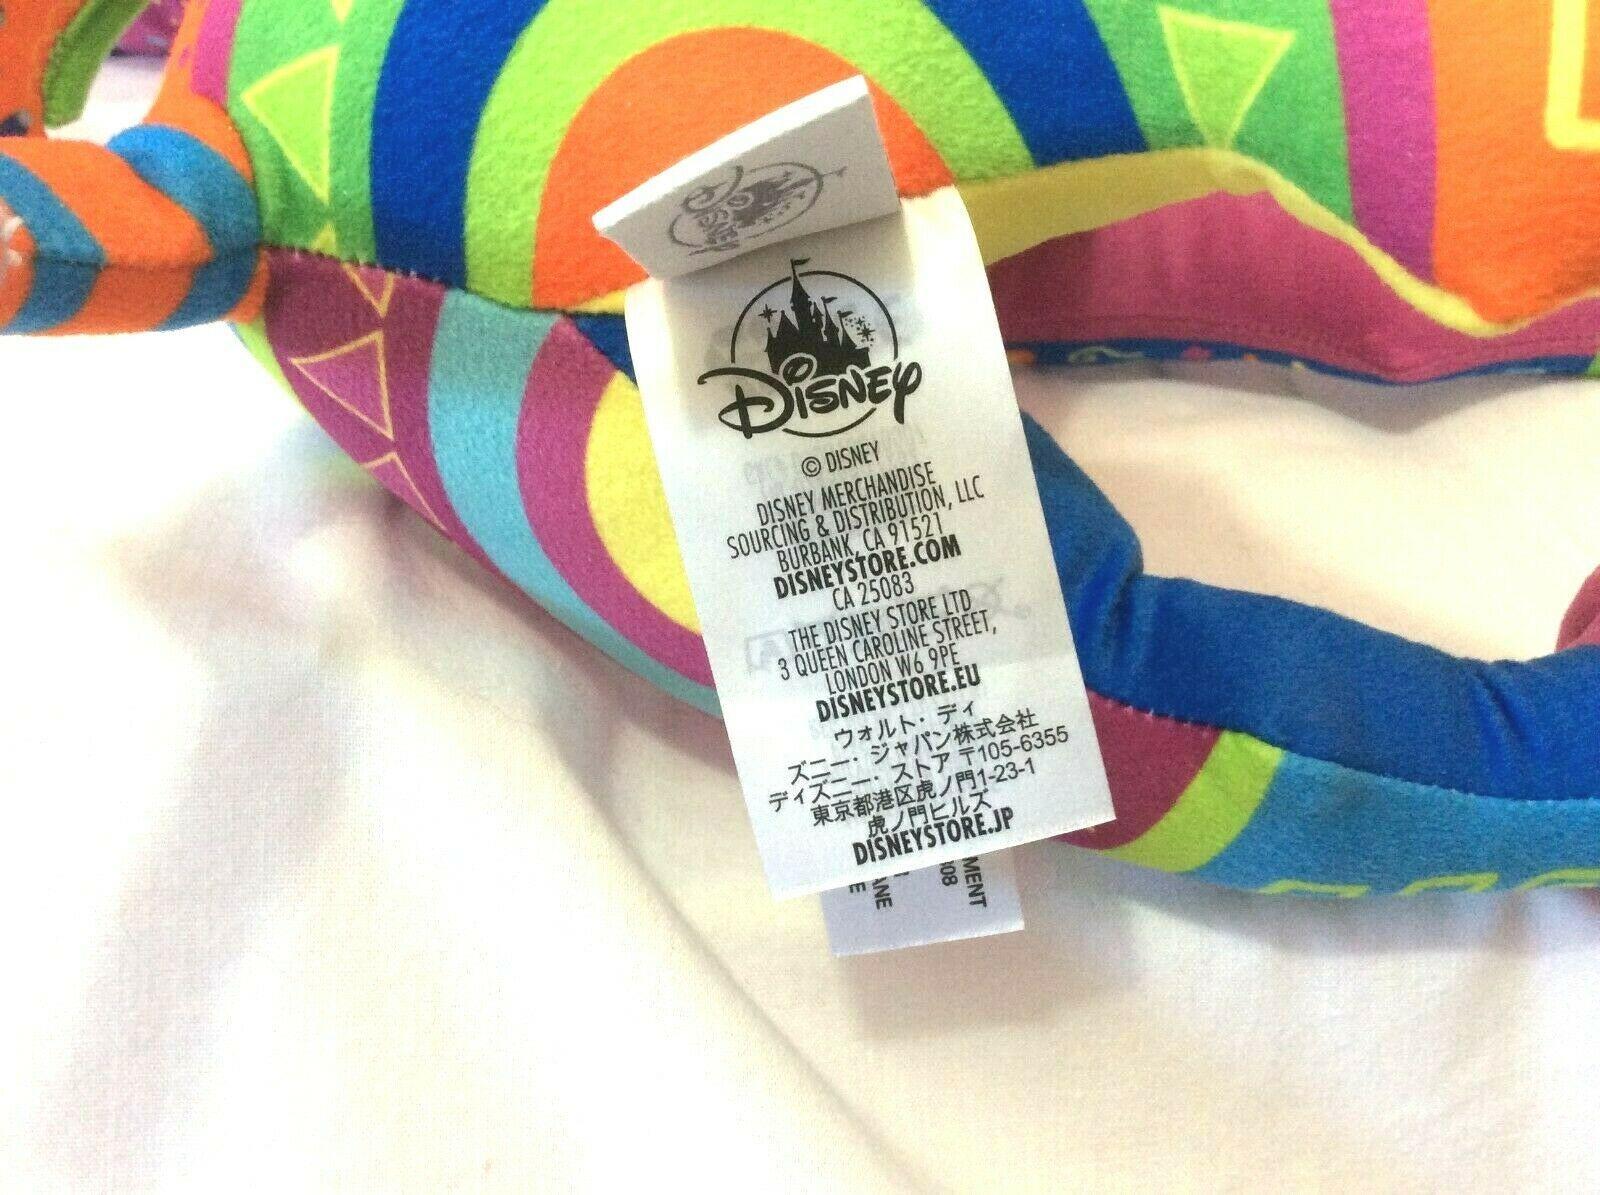 "Disney Pixar Stuffed Plush Coco Dante Alebrije 15"" Multi Colored Winged Dog"